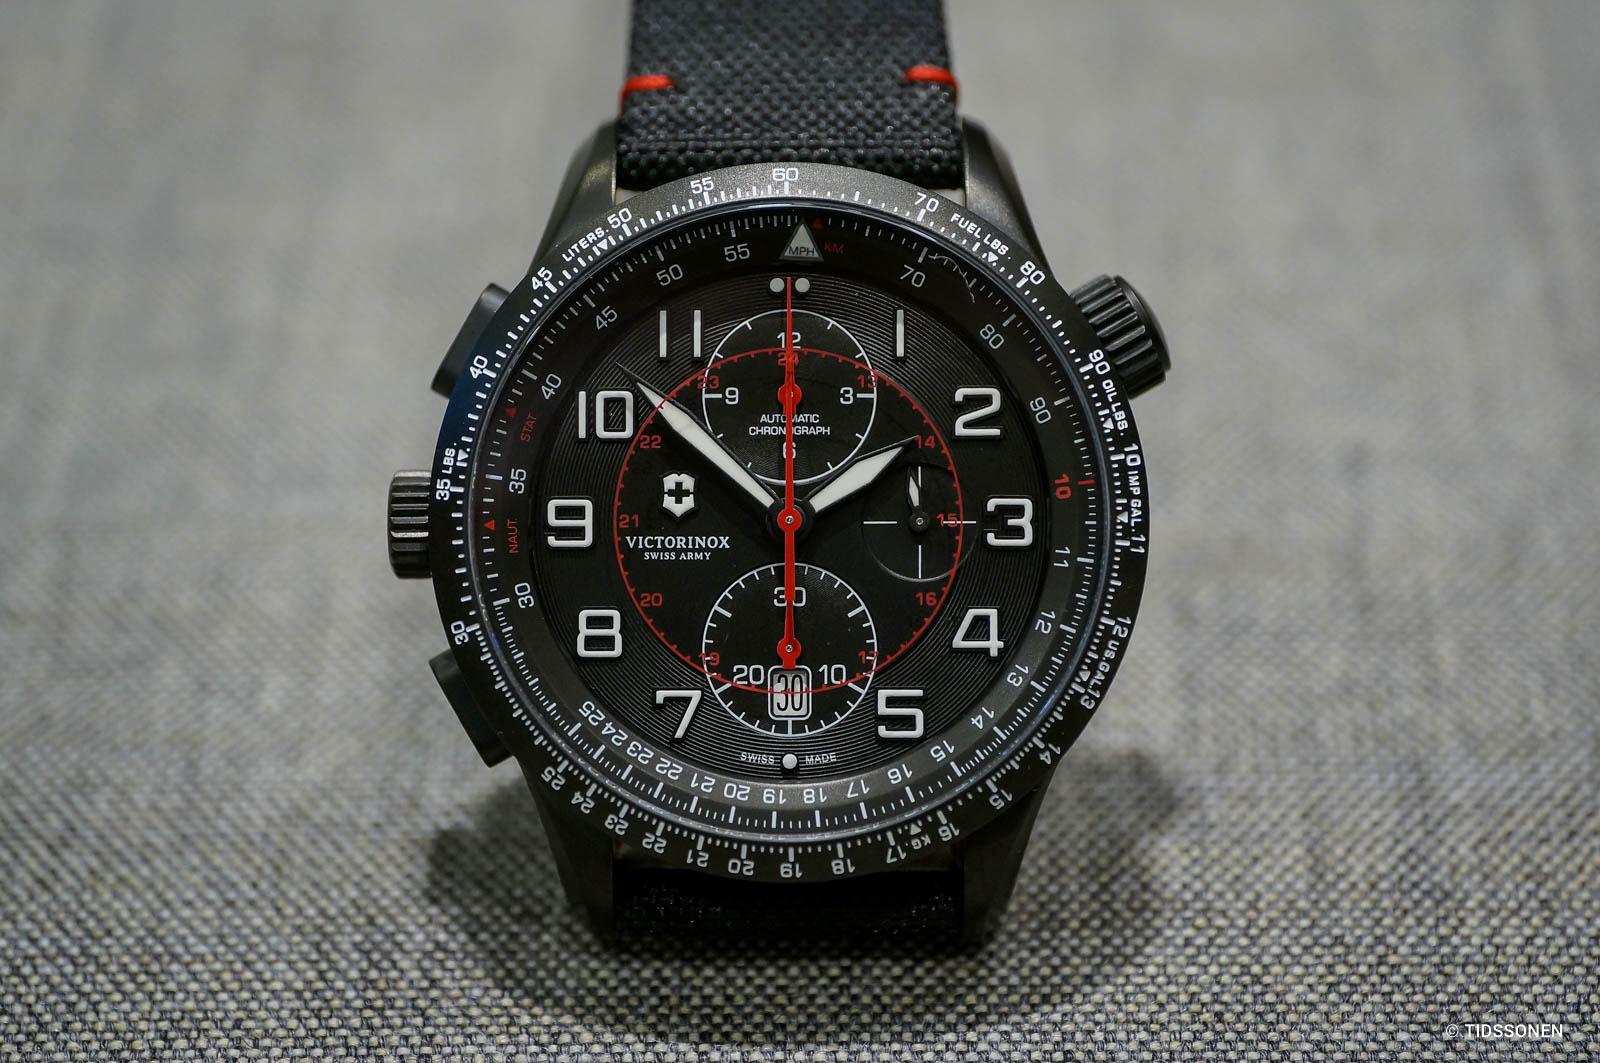 victorinox-airboss-mach-9-black-edition-02262